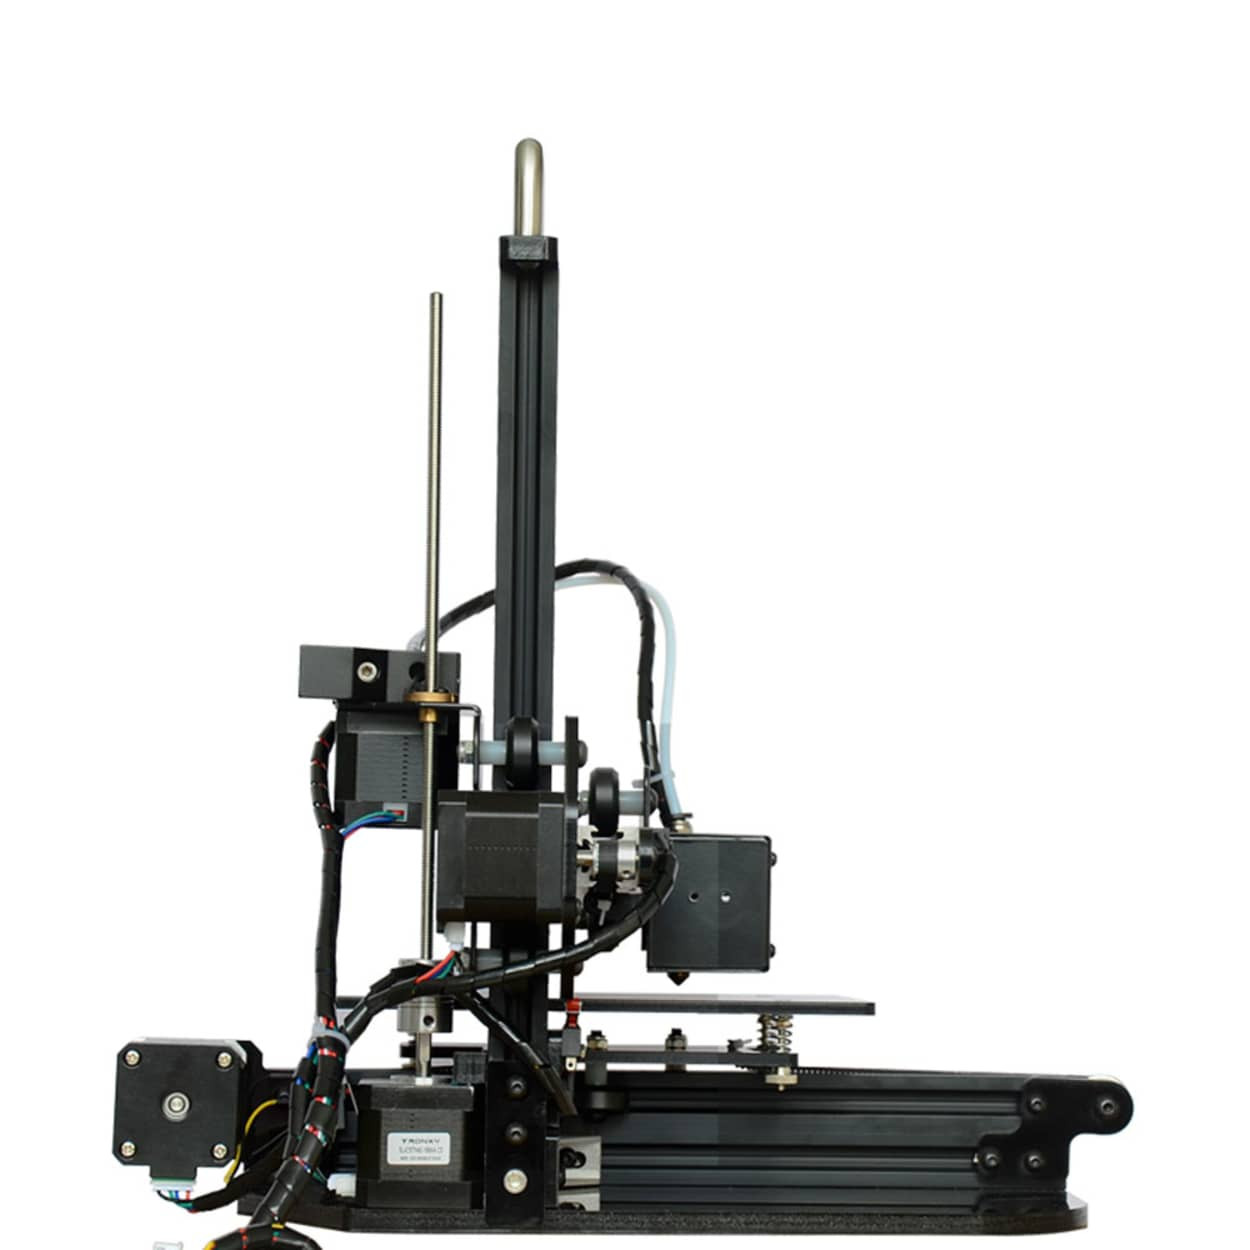 Best ideas about DIY 3D Printer Kit . Save or Pin TRONXY X1 Desktop DIY 3D Printer Kit 150 150 150mm Now.